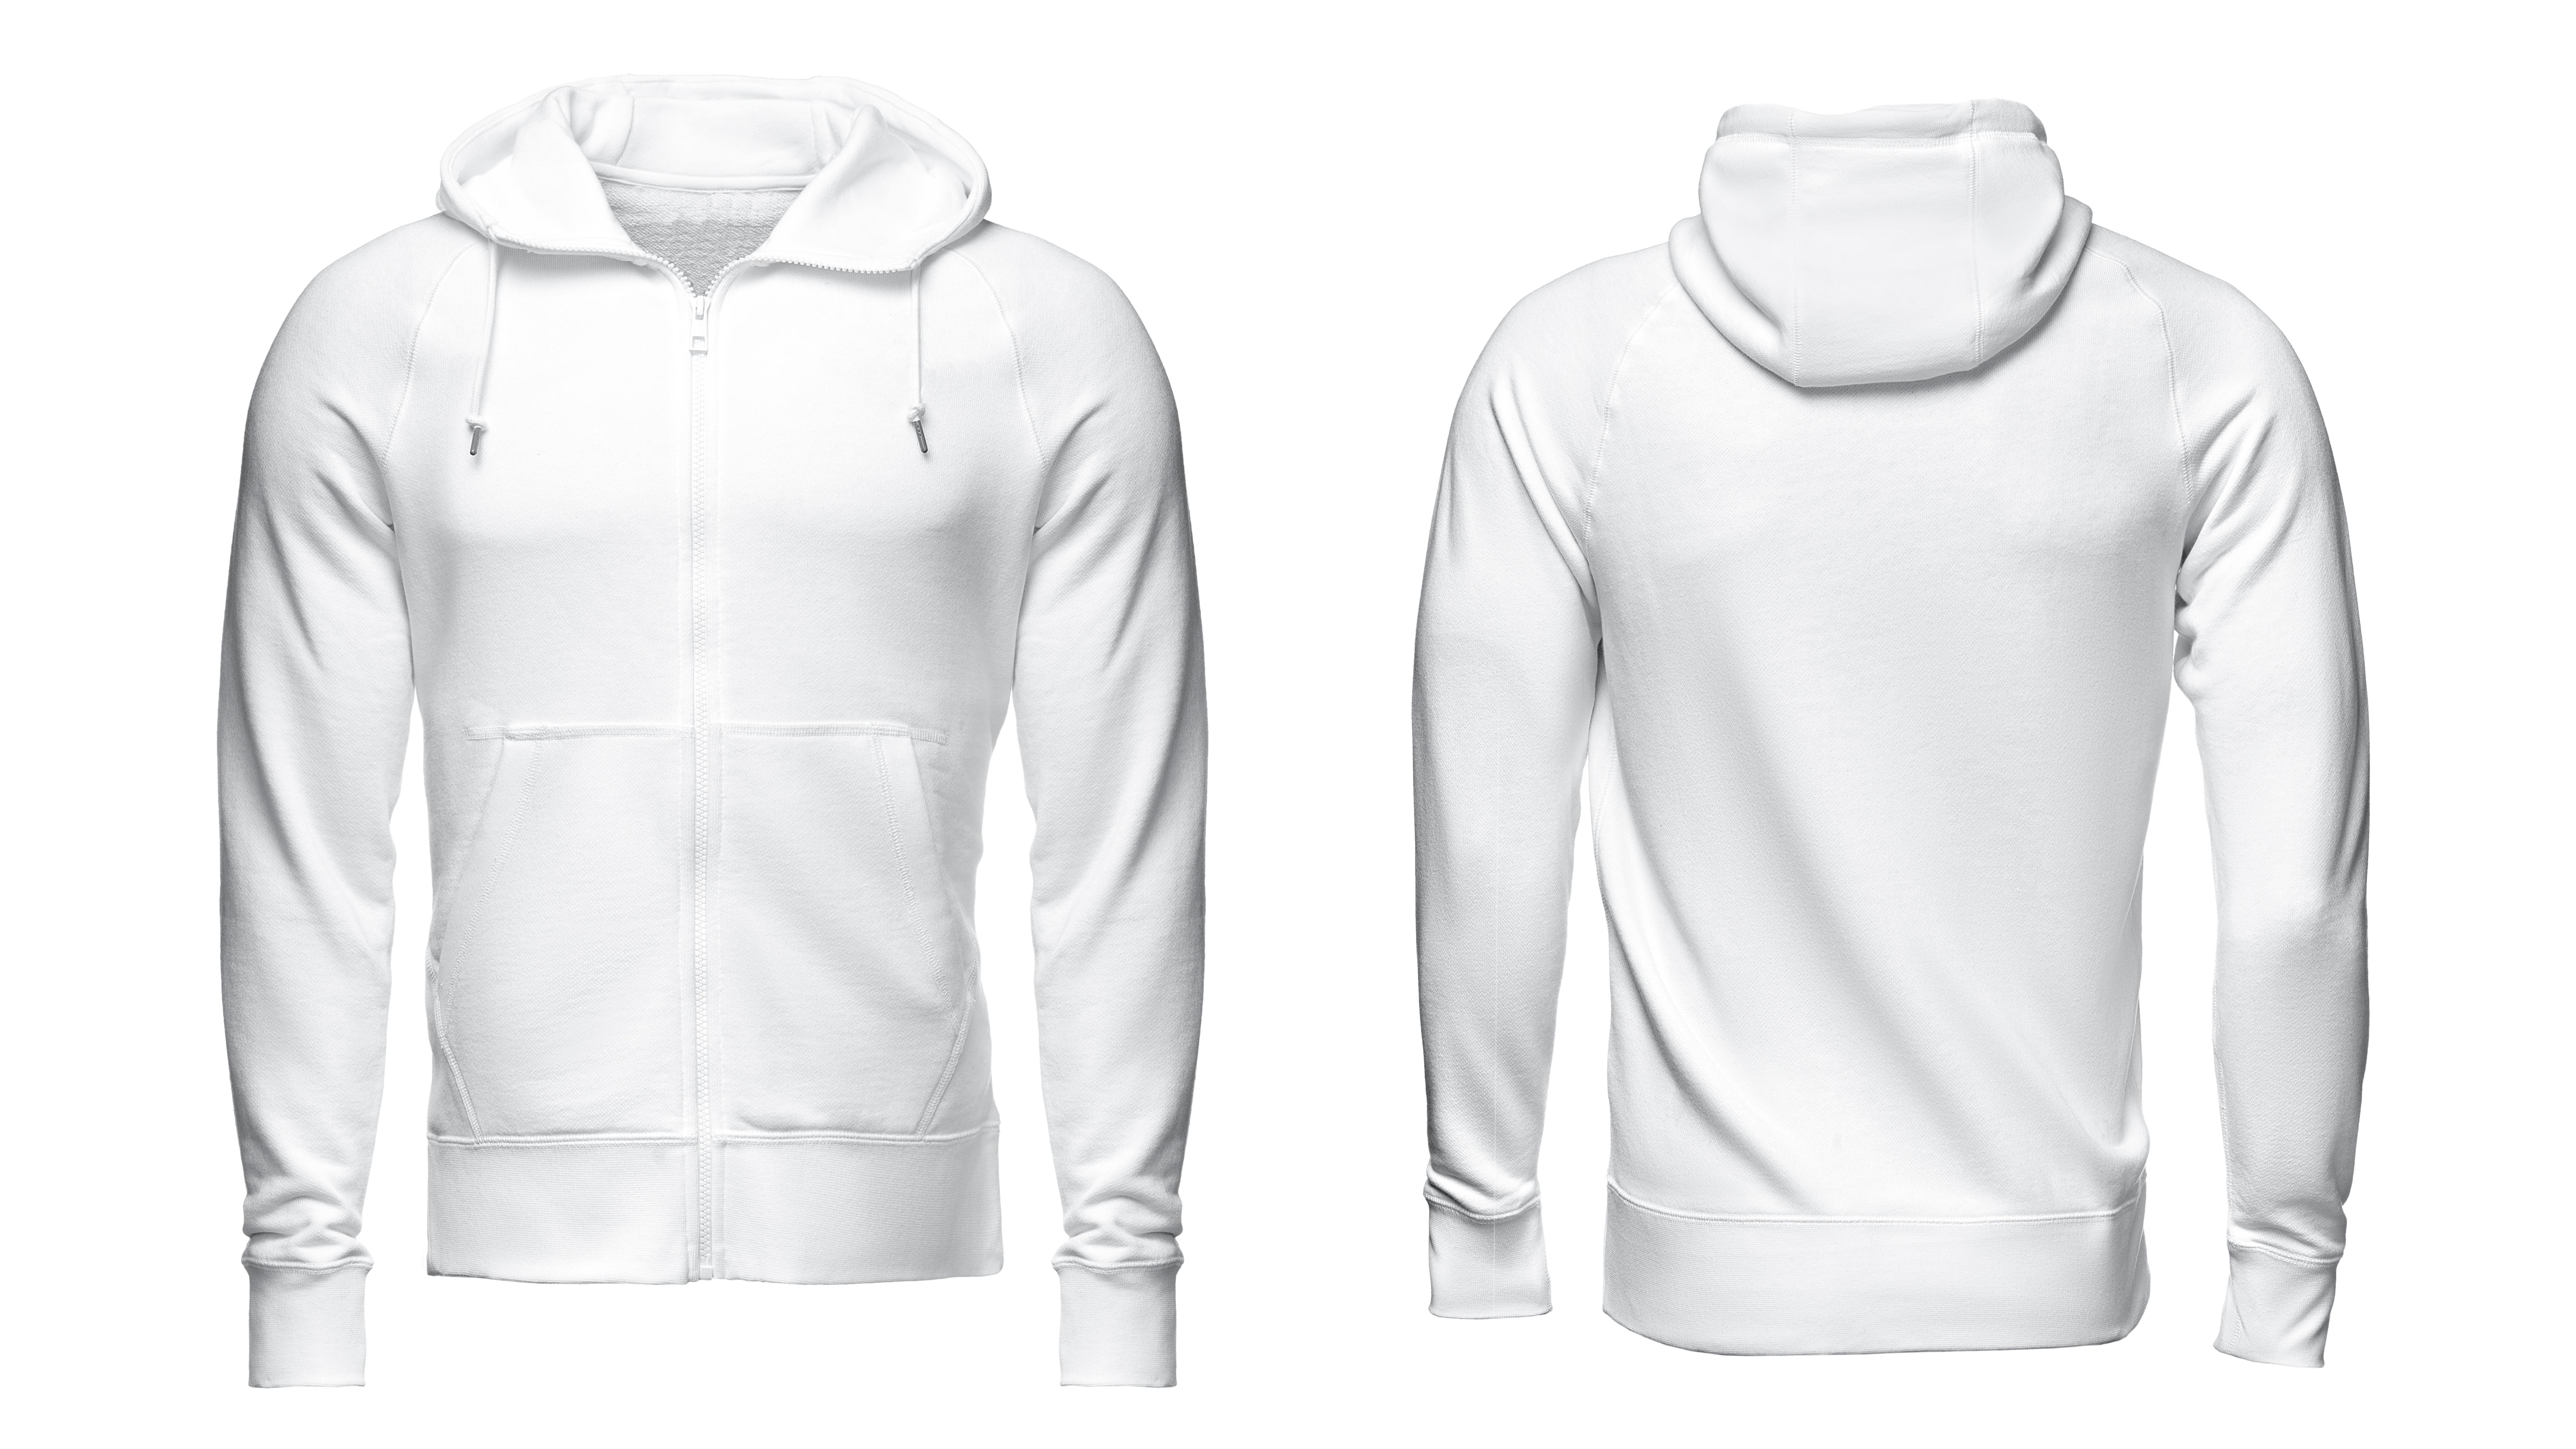 Custom made sweatshirts with hood (5)